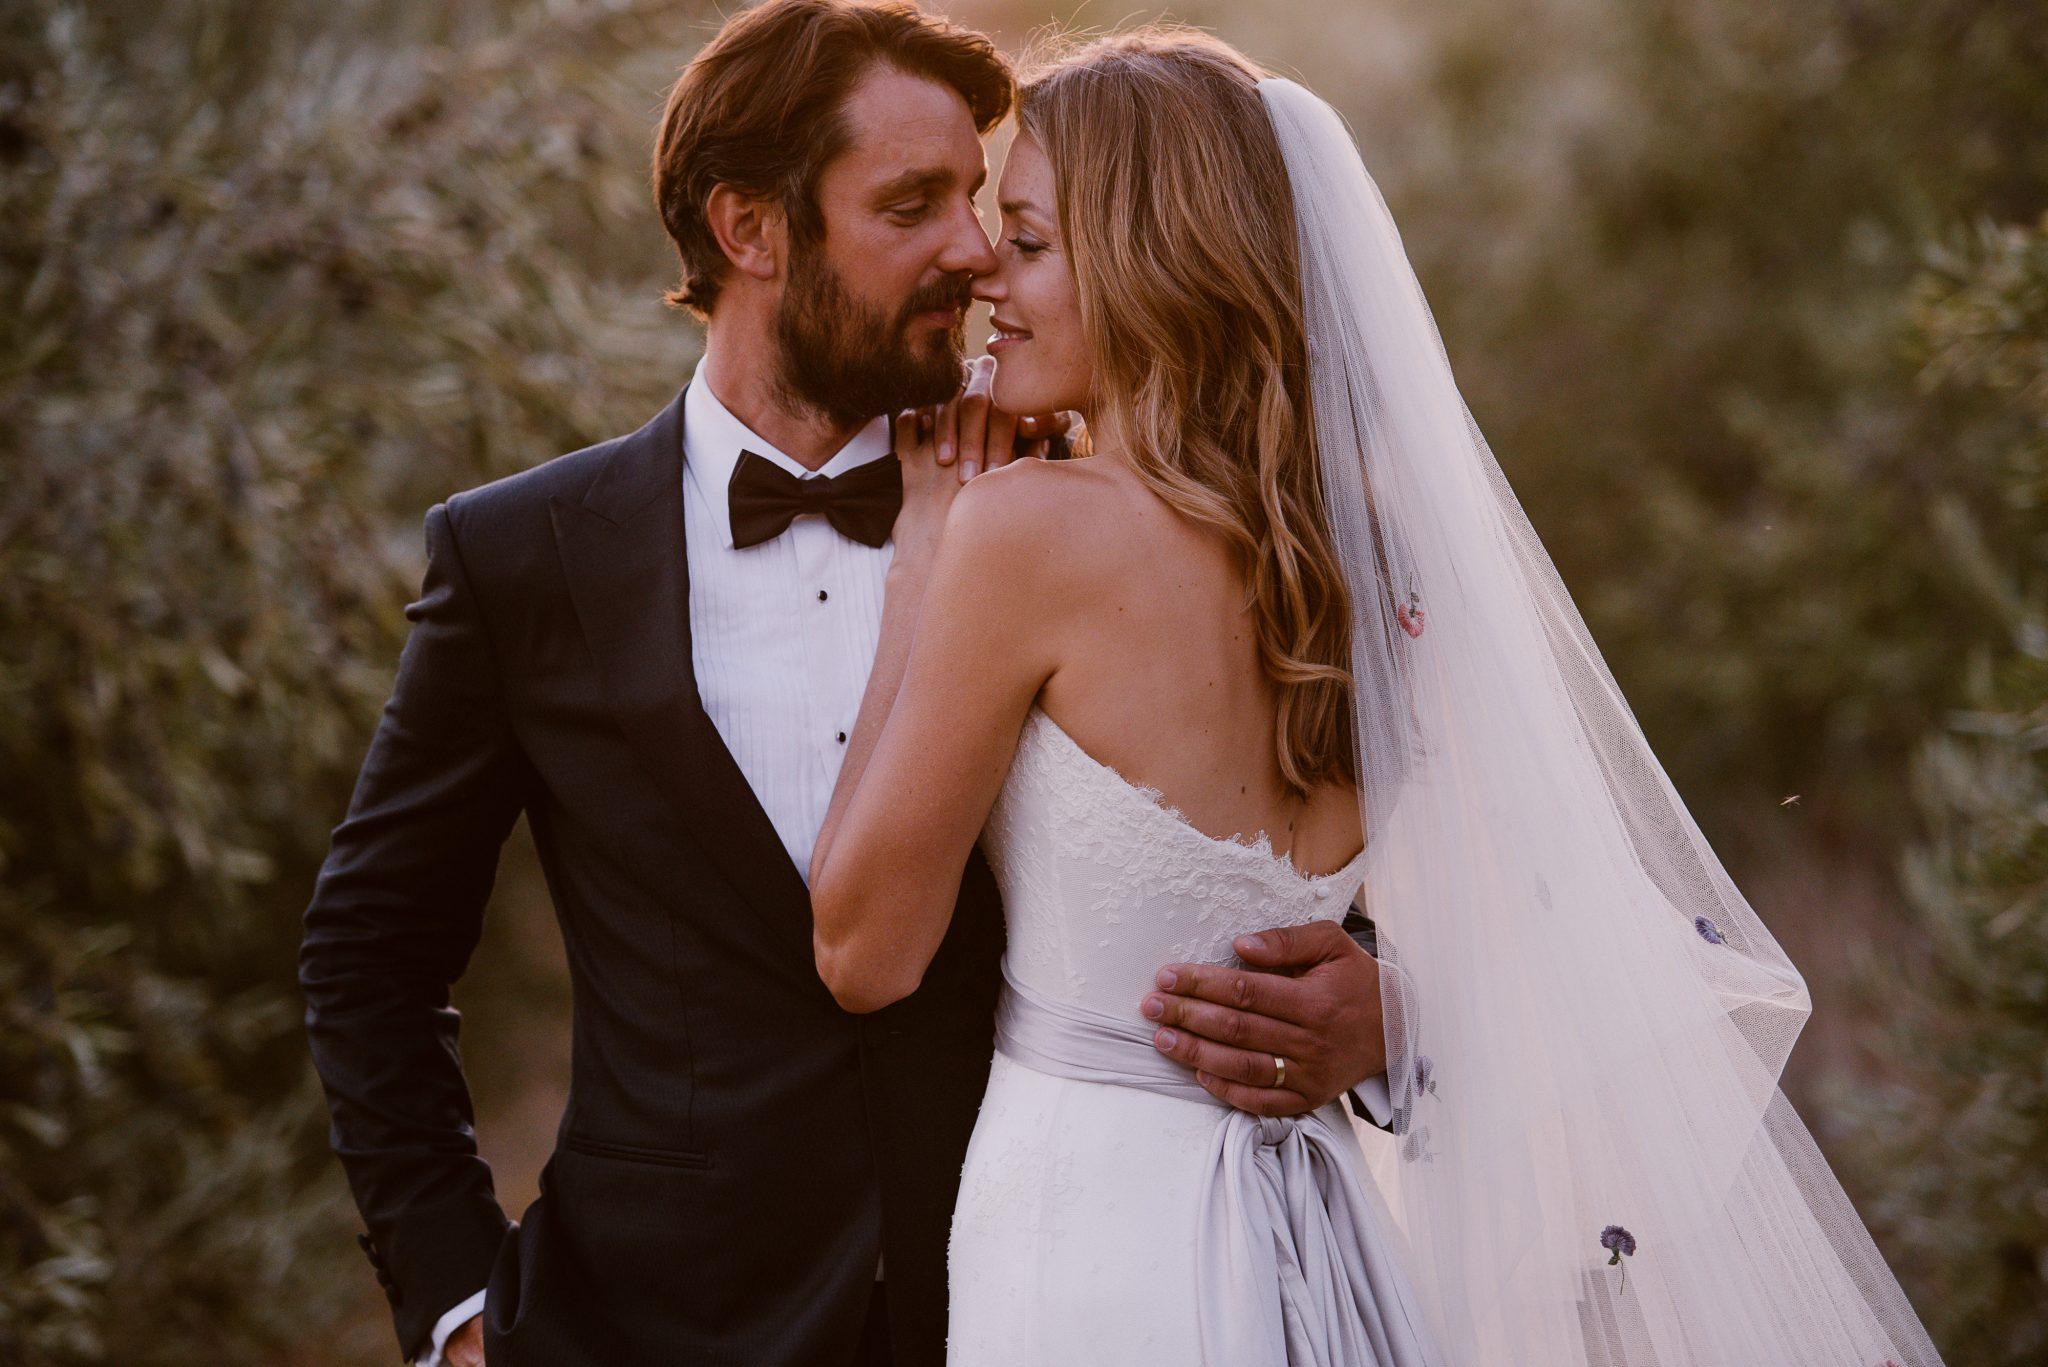 Phillipa-Lepley-Low-Back-Wedding-Dress